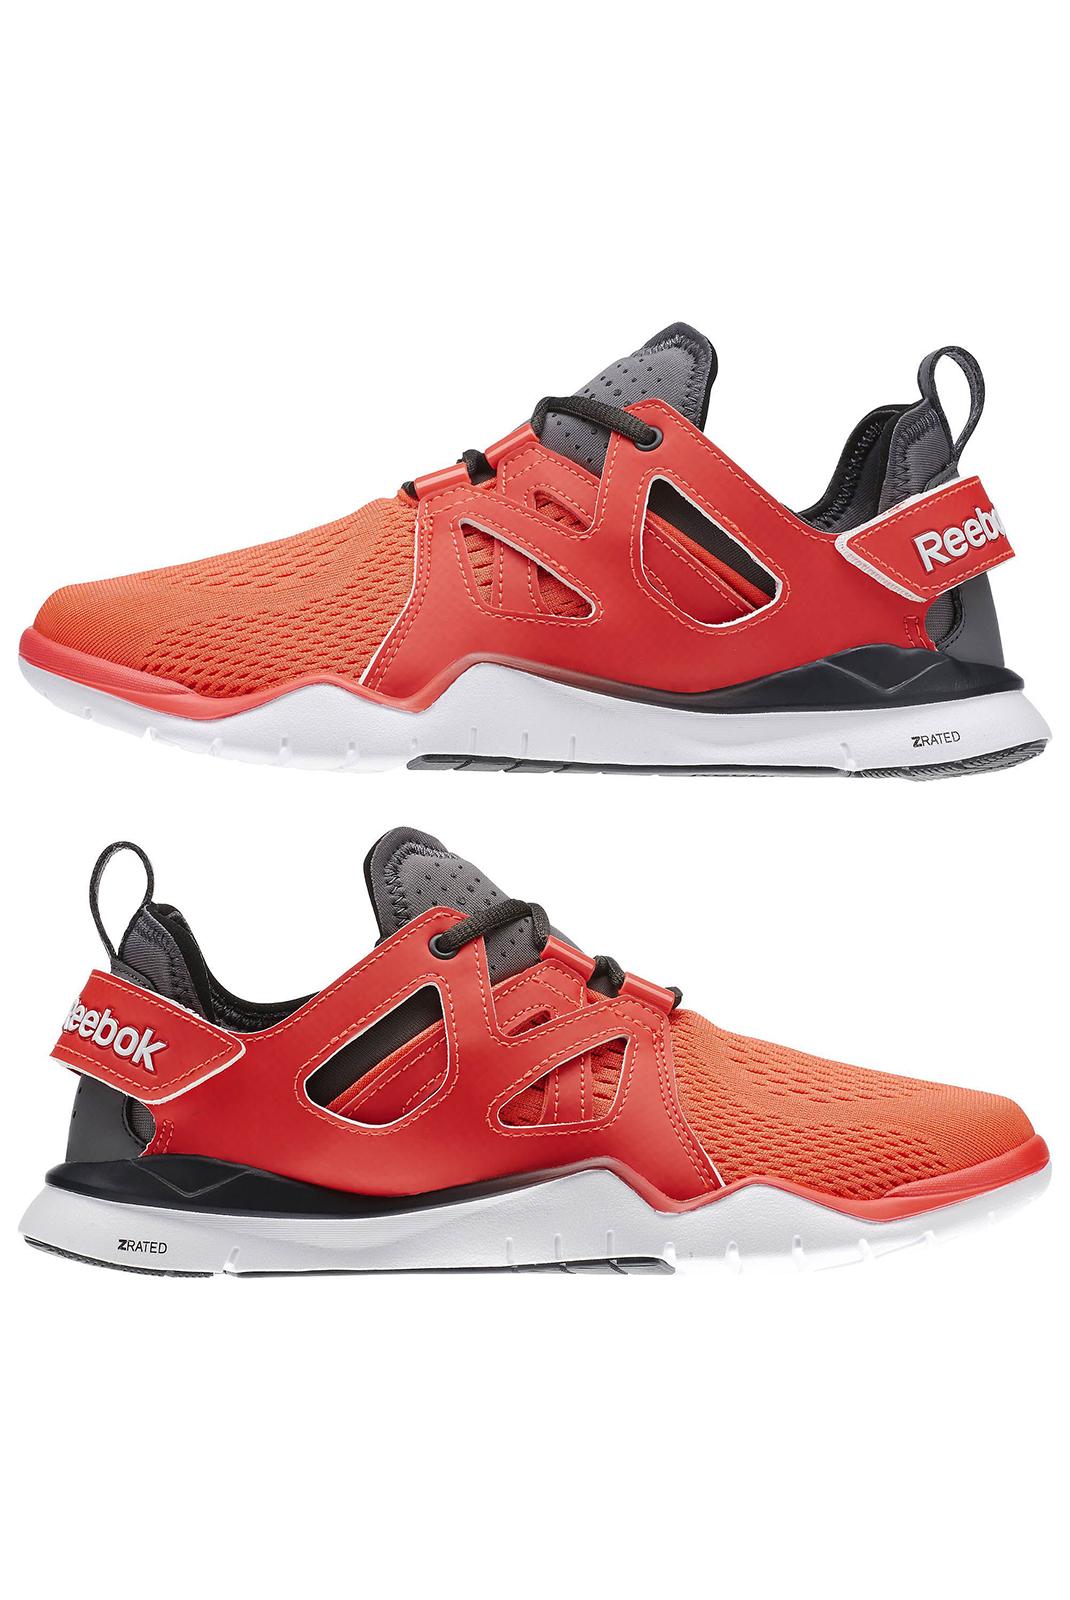 Baskets / Sneakers  Reebok M49843 ZCUT TR 2.0 CHERY